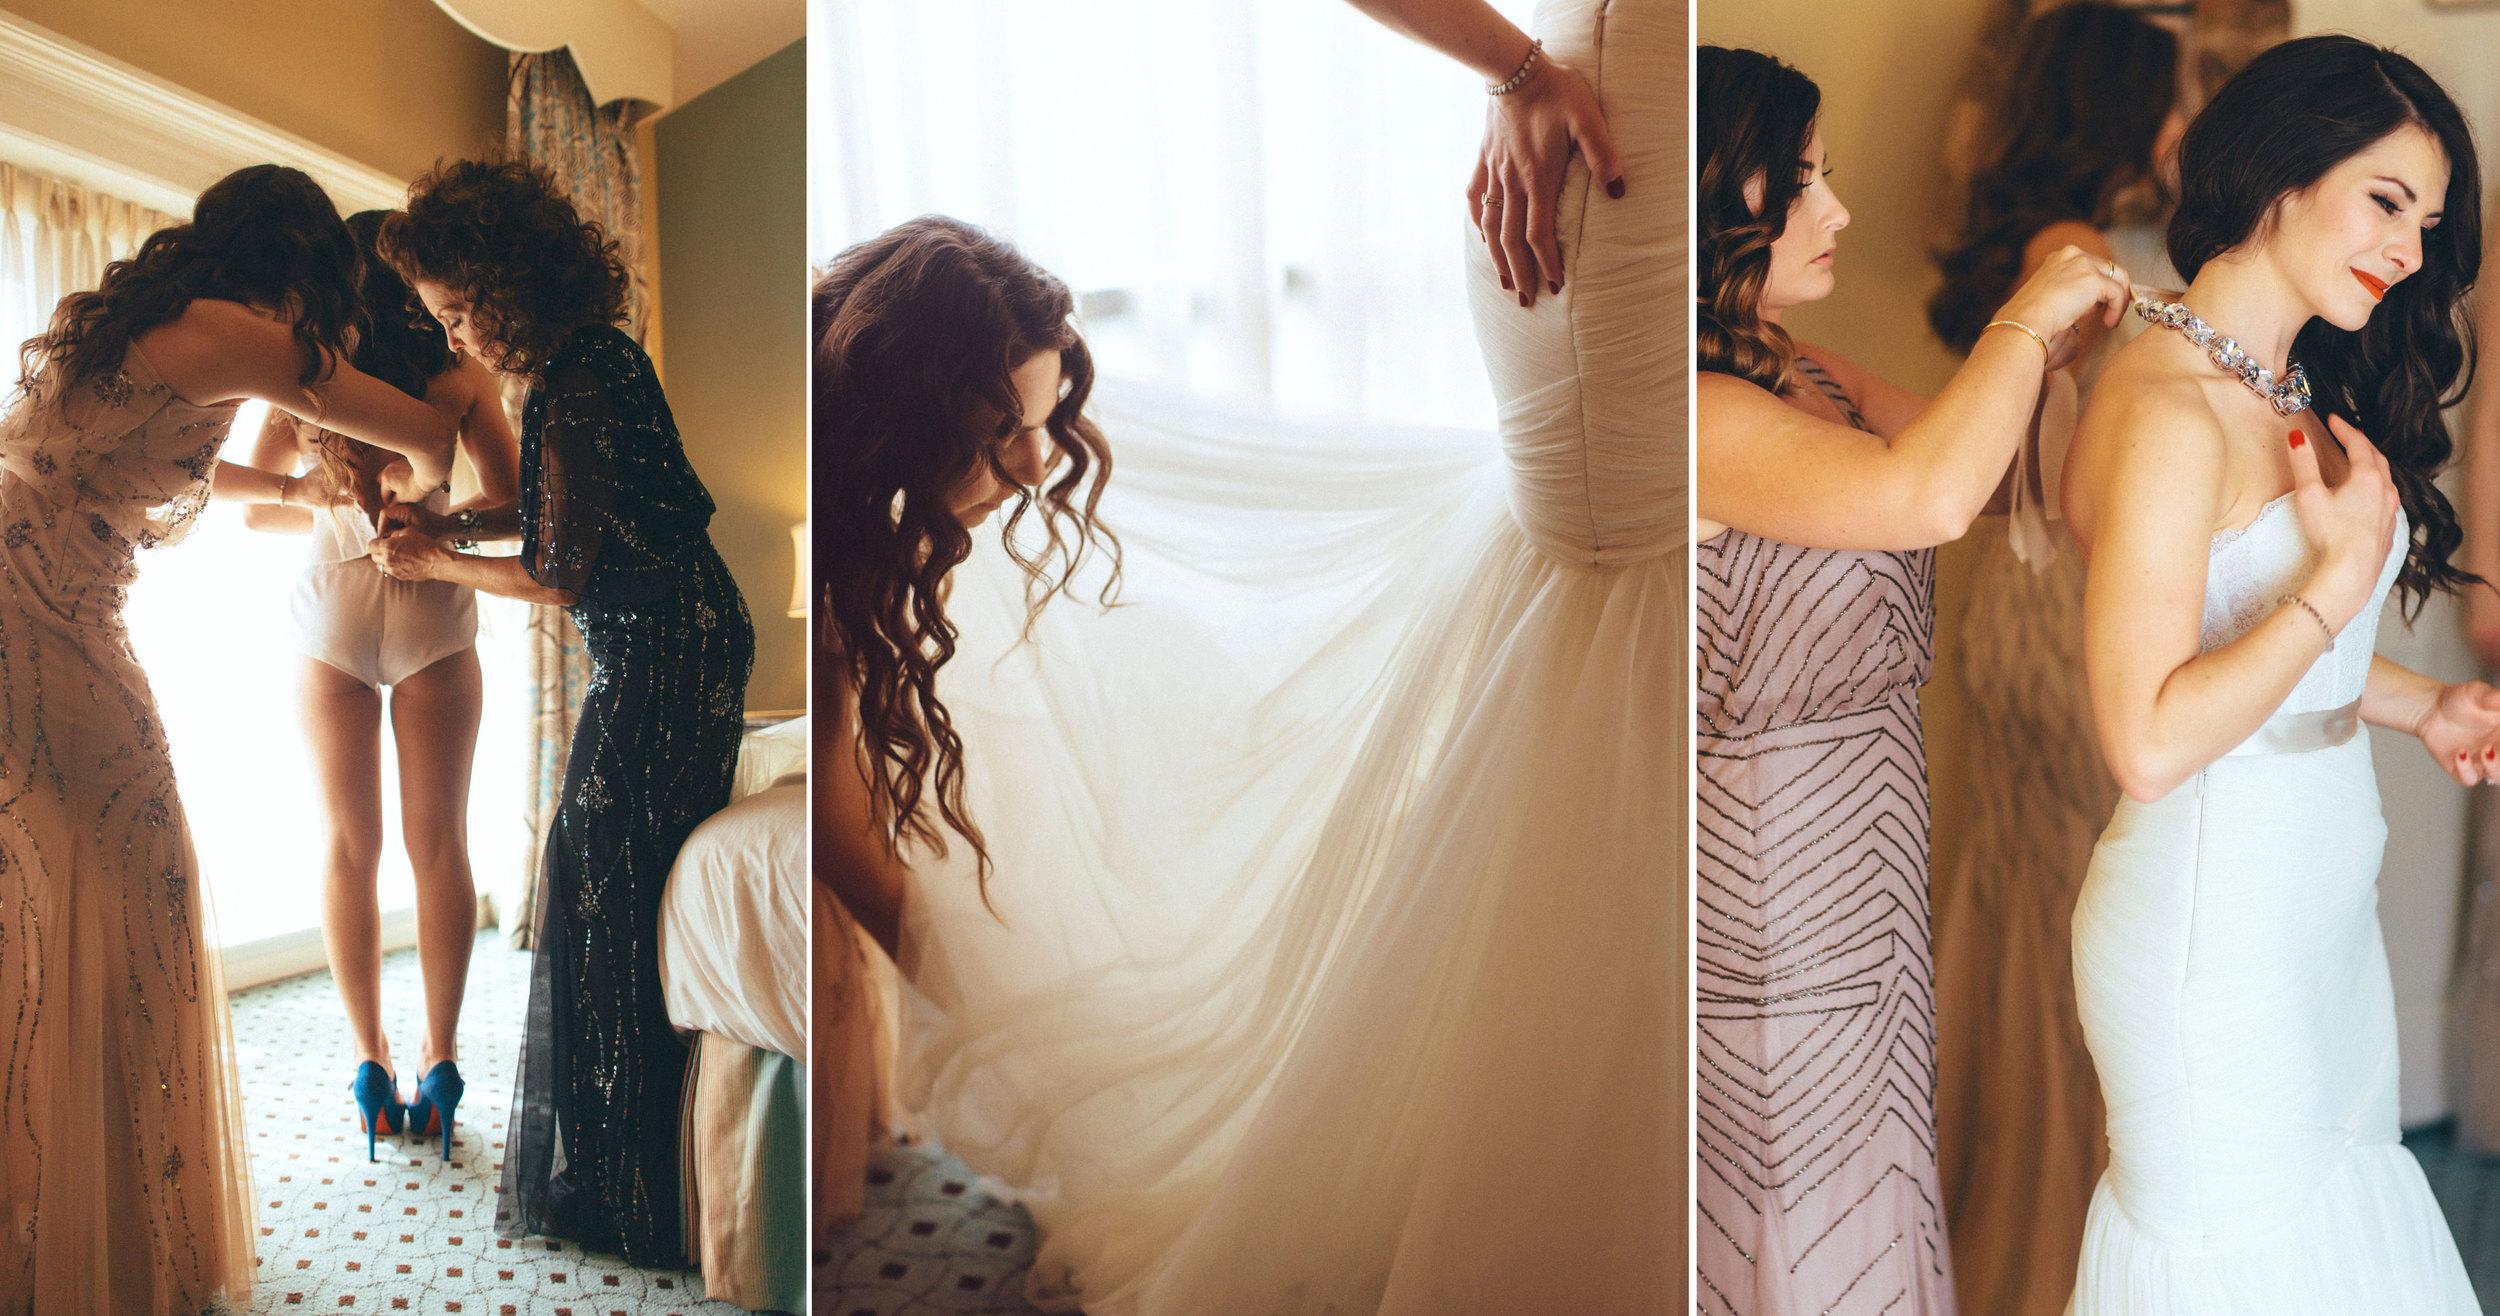 Me & Mr. Jones Wedding, Bride Getting Ready, Free People Lace Bralette, Watters Carina Corset, Black Tie Wedding, Nashville Wedding